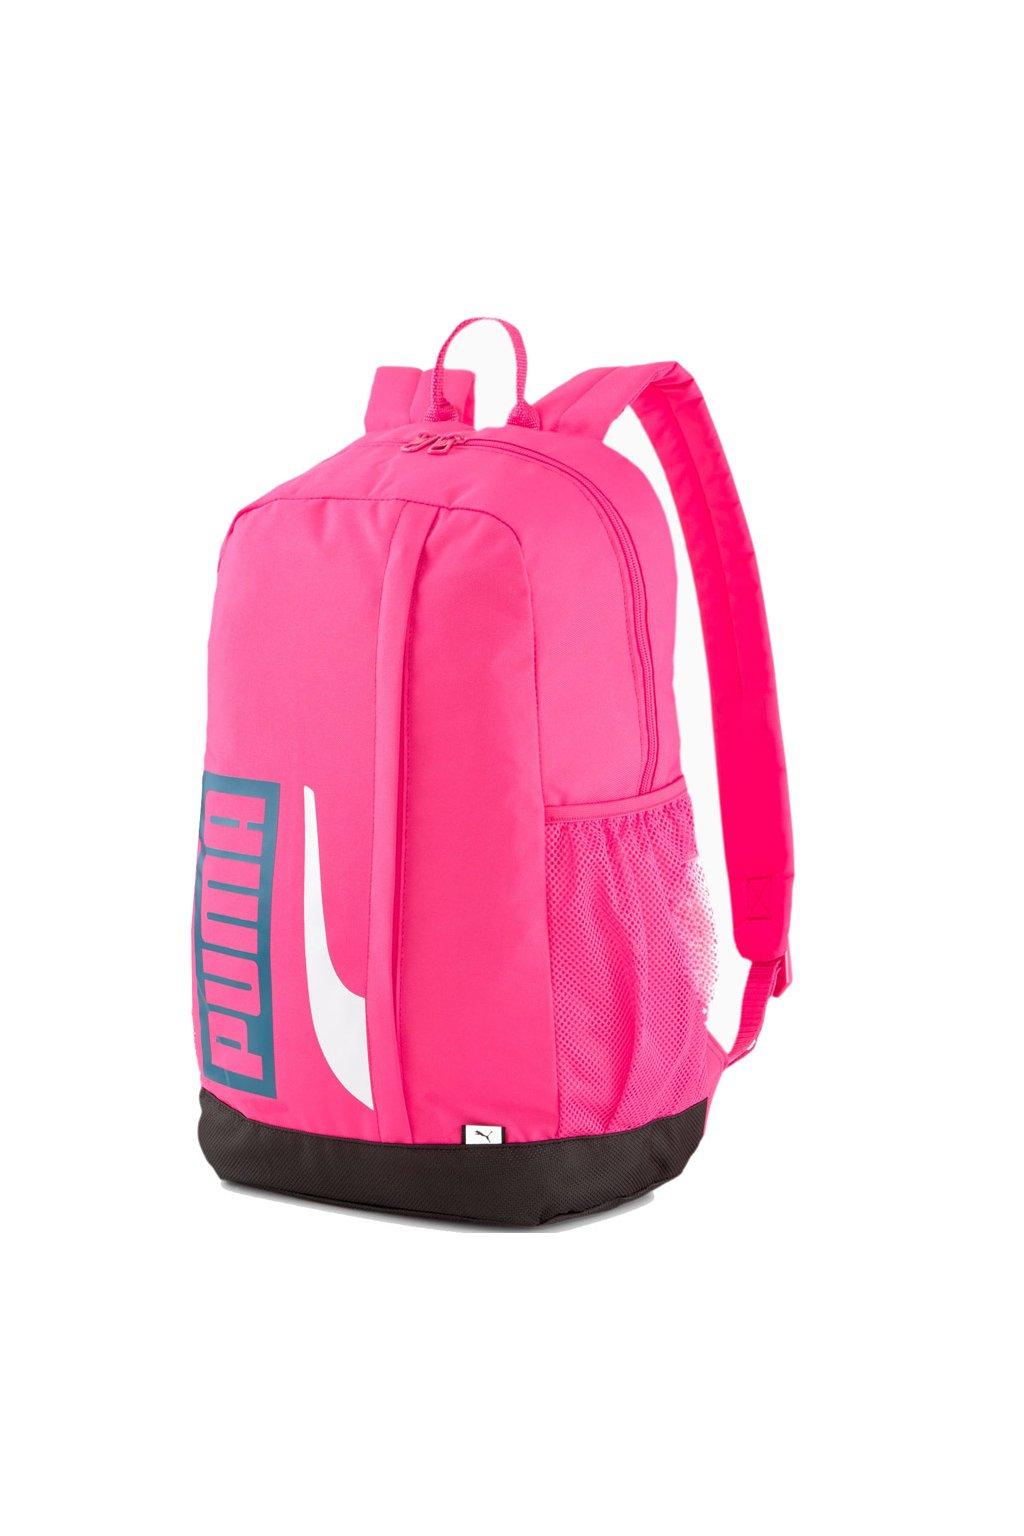 Batoh Puma Plus II ružový 075749 18